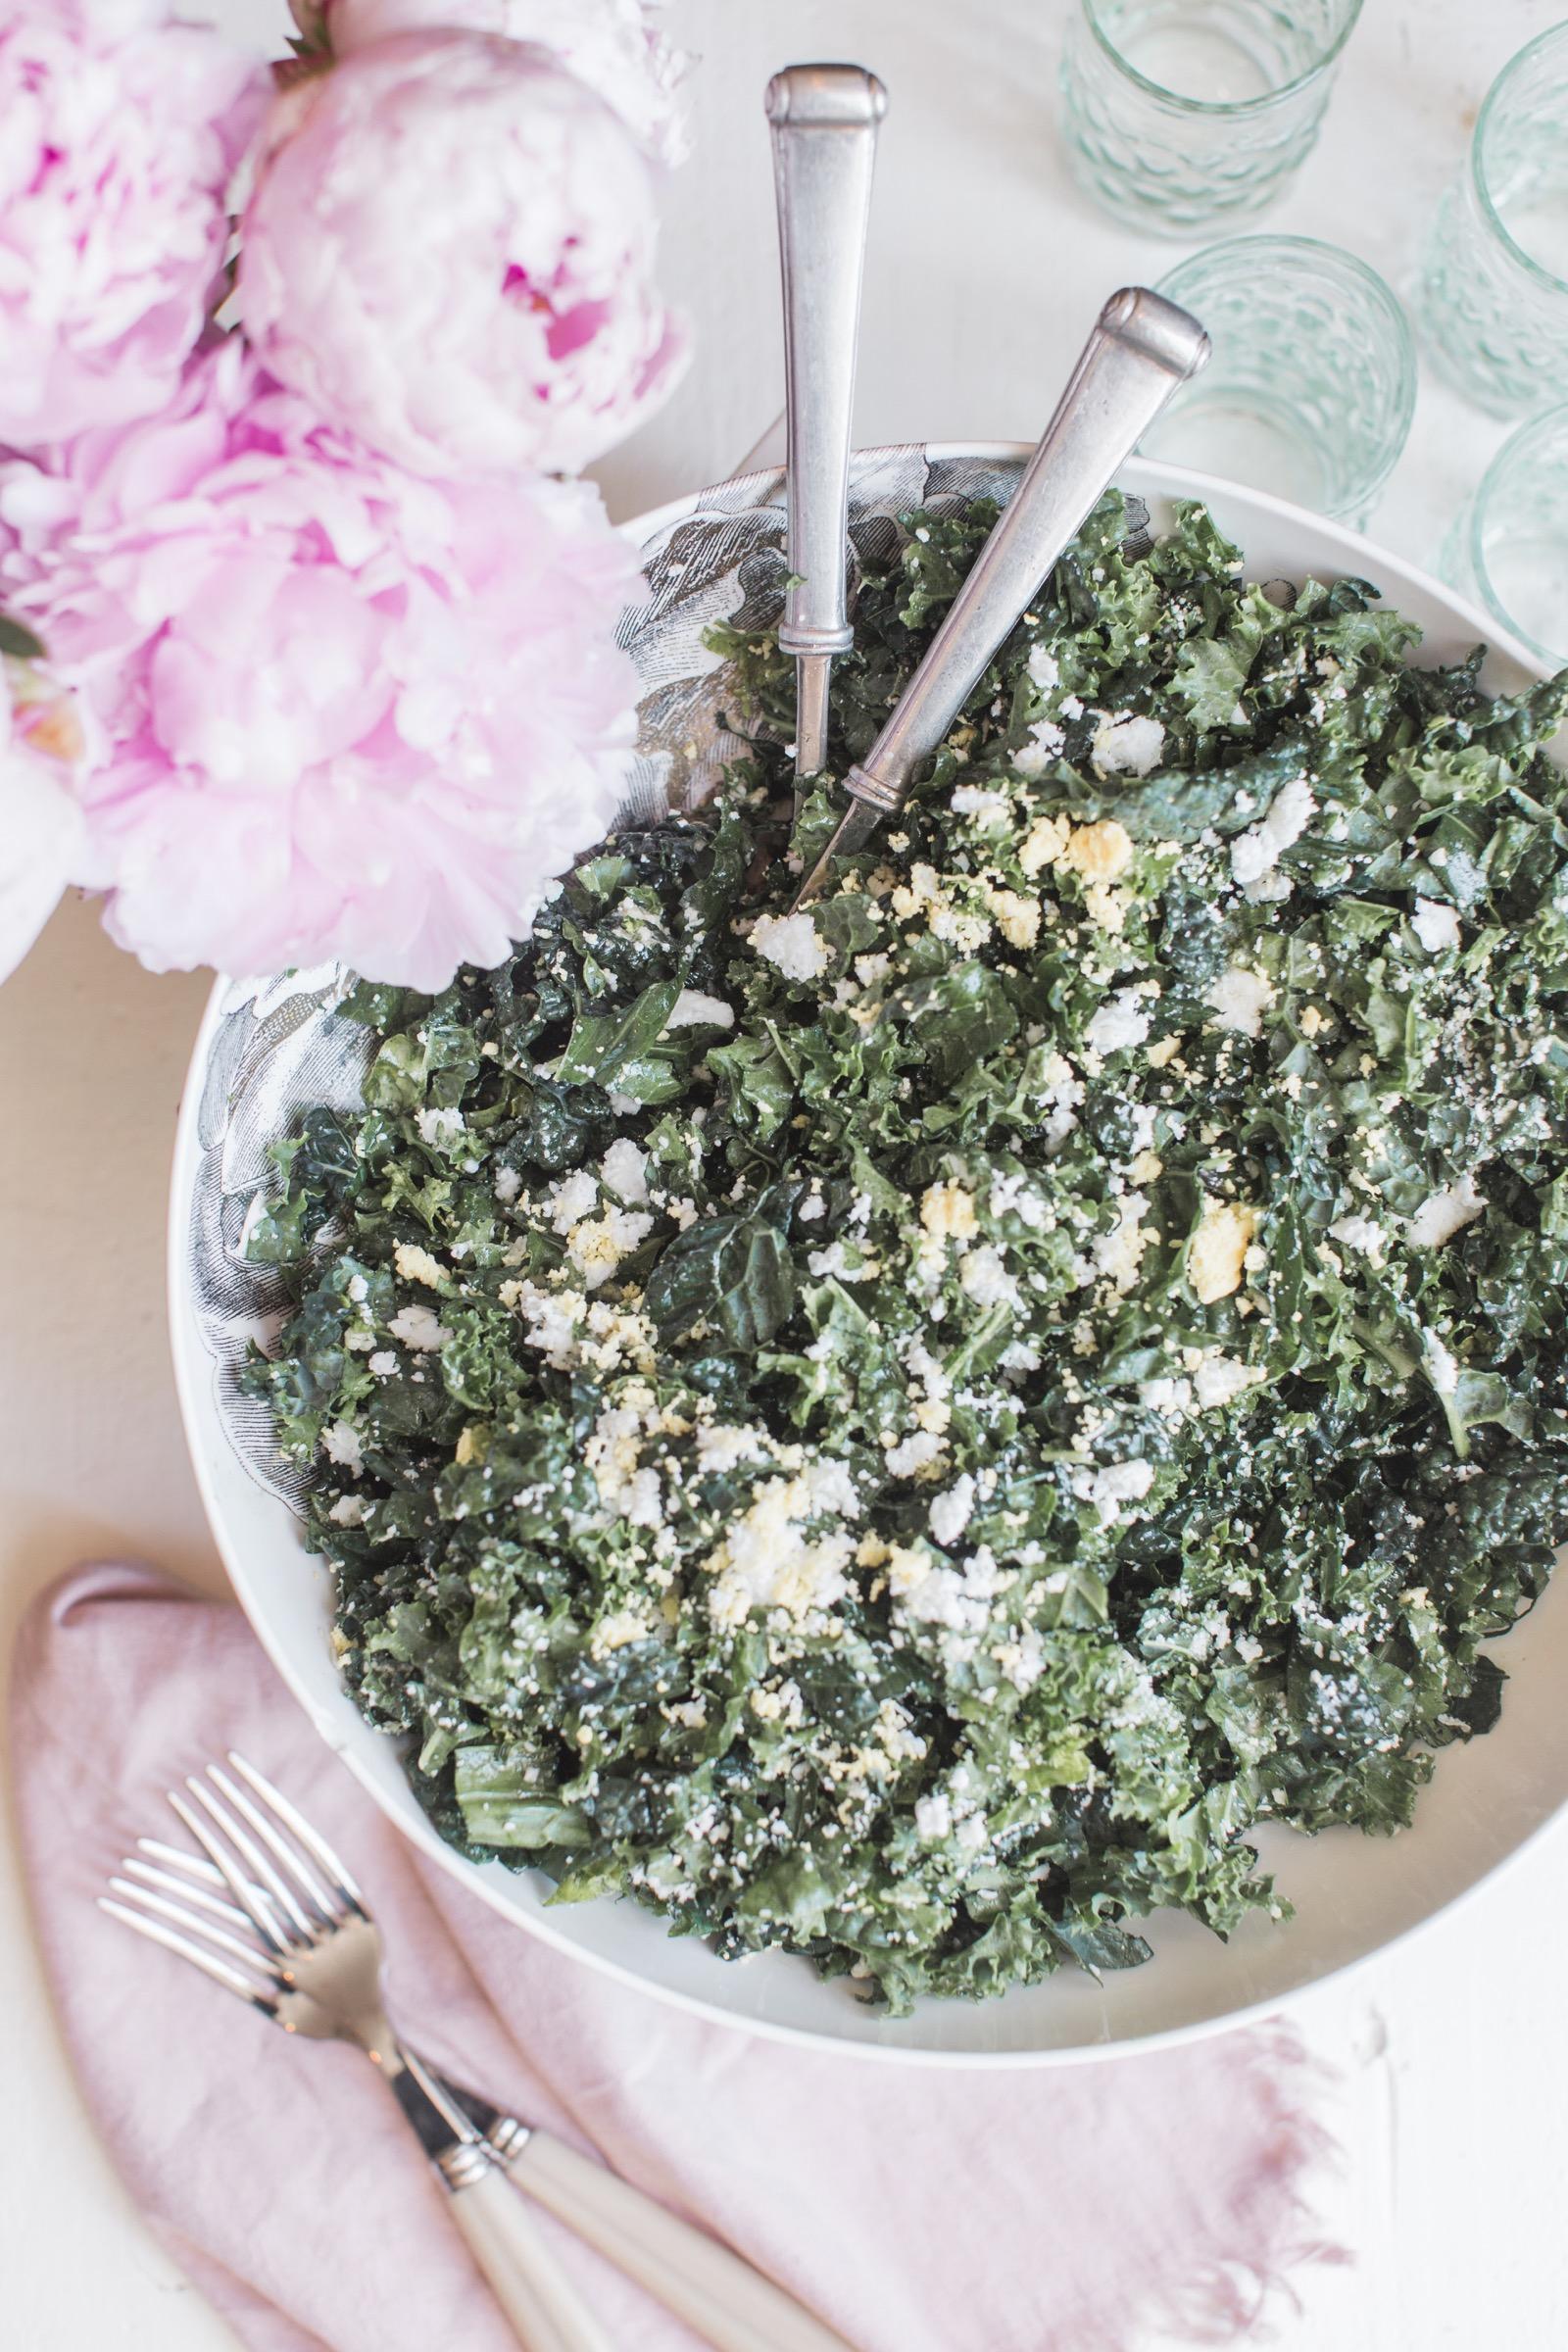 One Kings Lane Recipe Kale Caesar Slaw